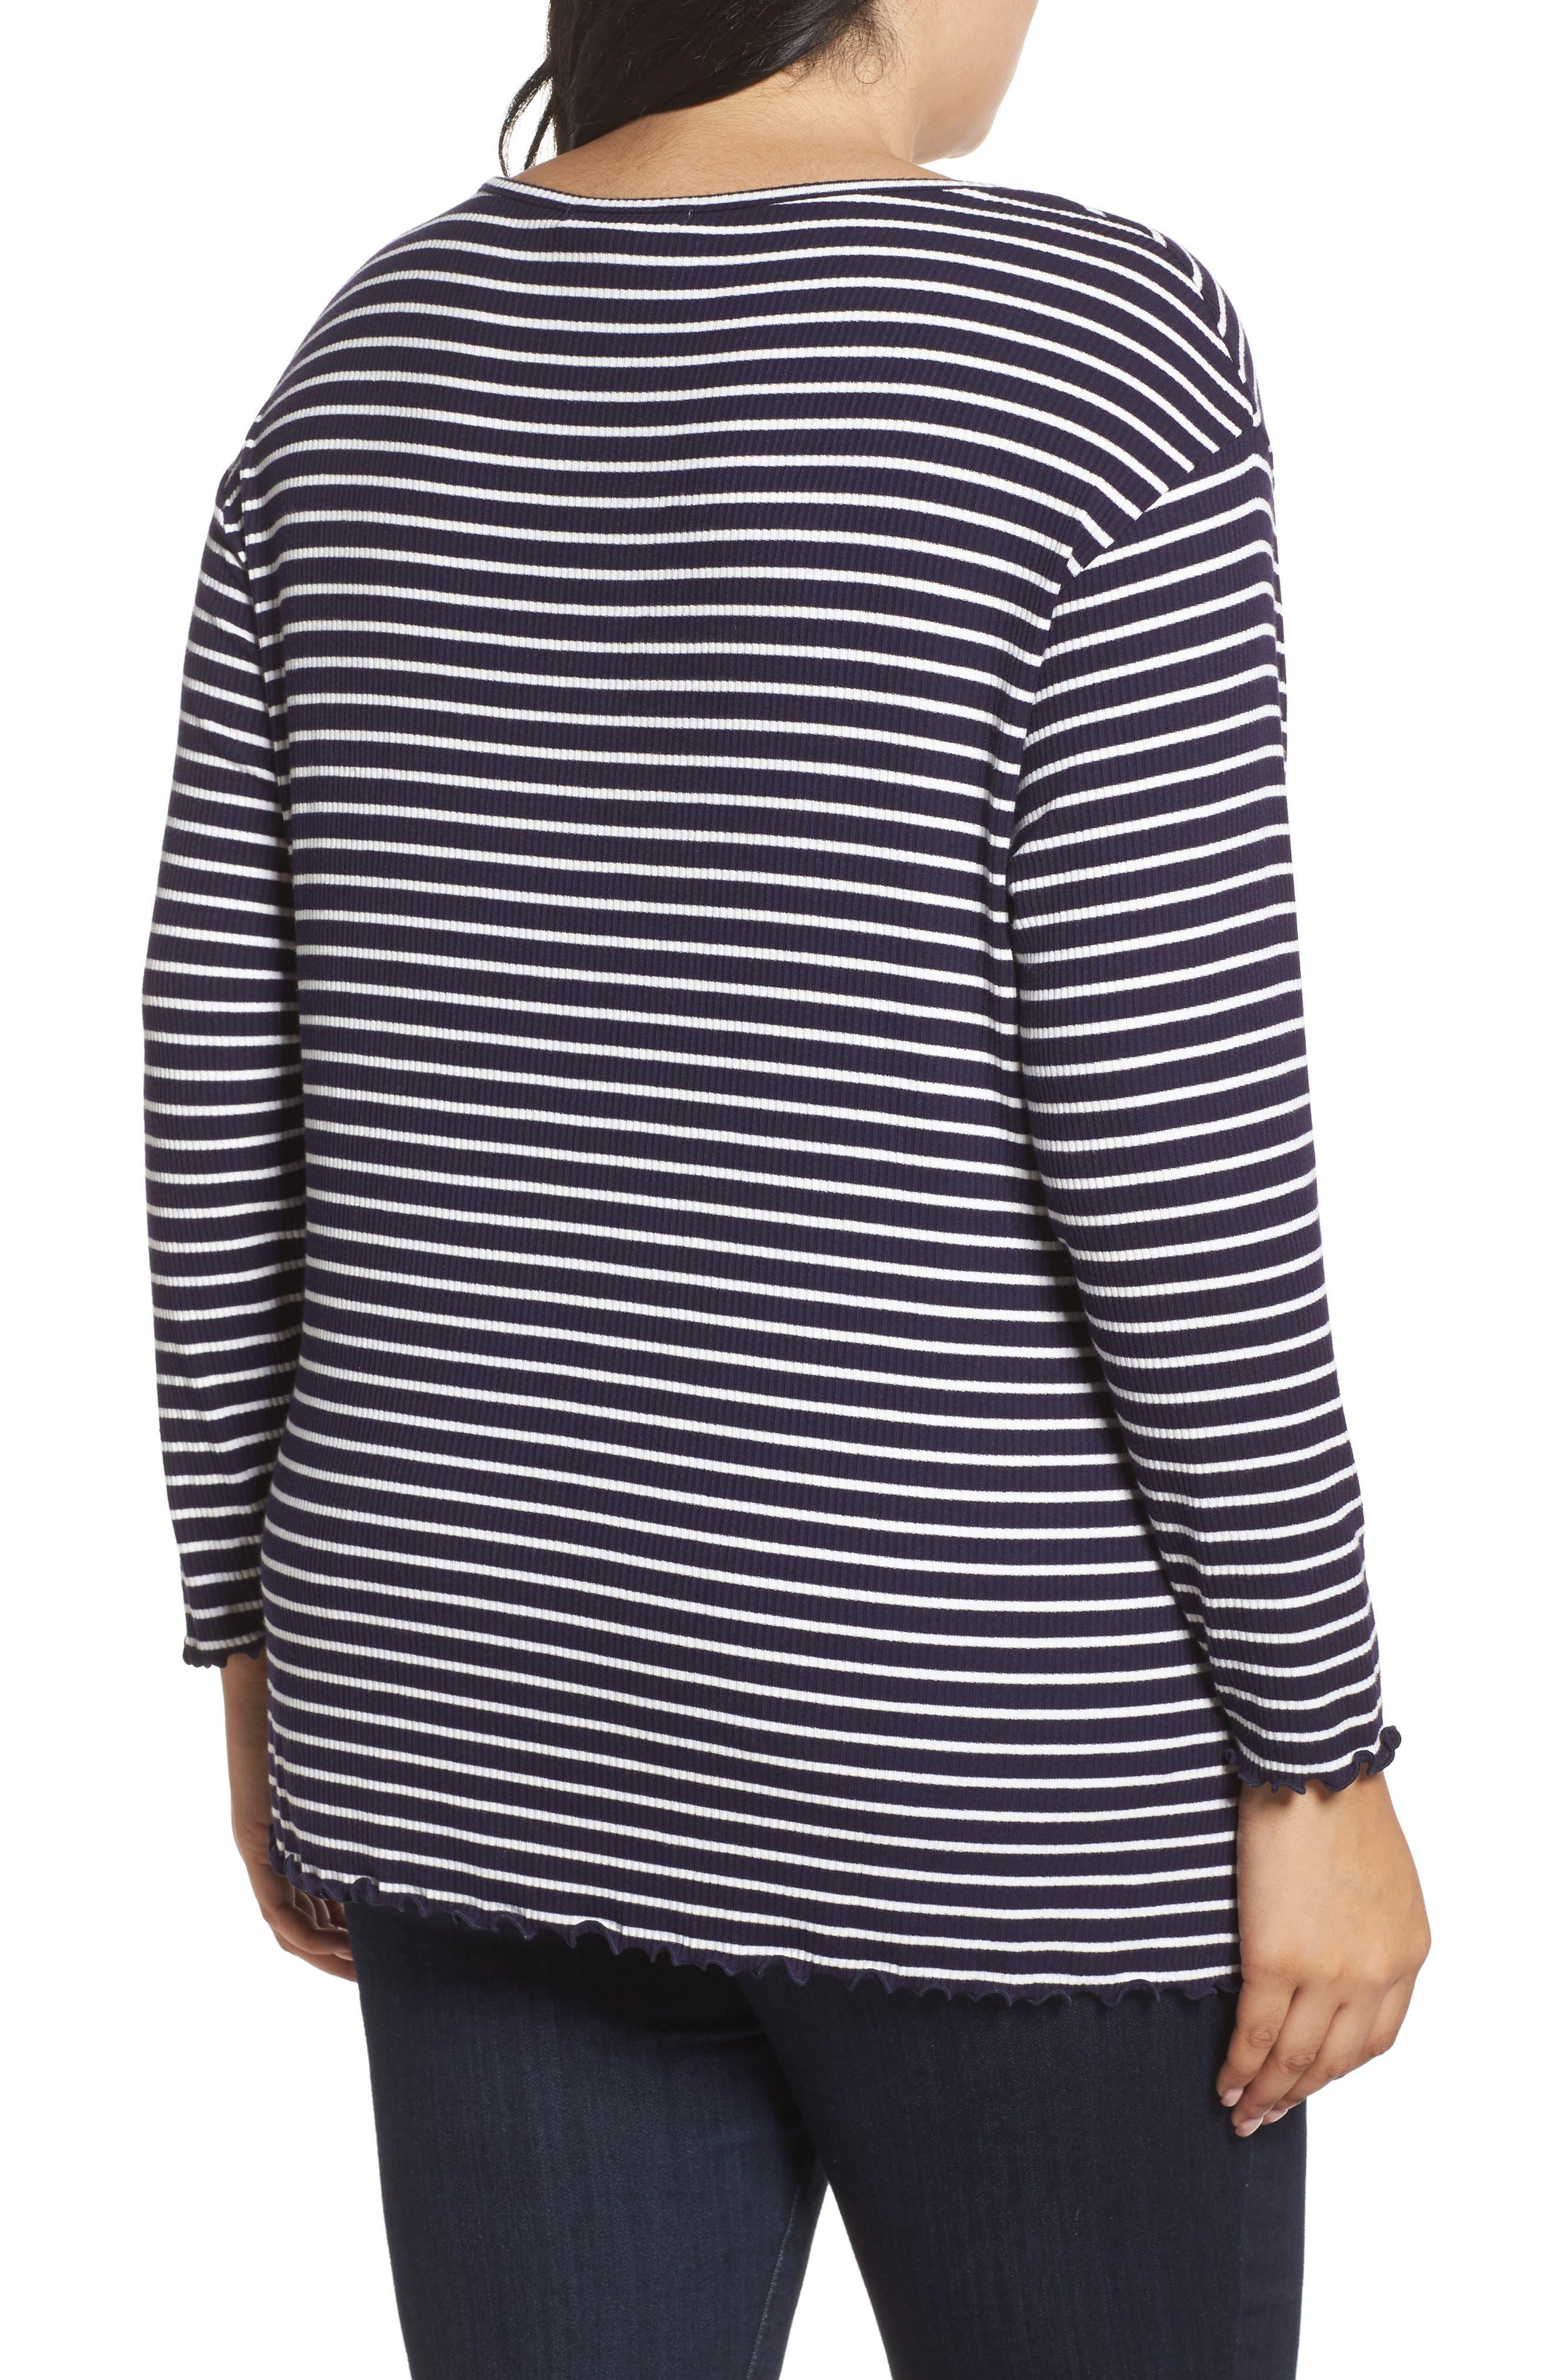 Scoop Neck Long Sleeve Tee,                             Alternate thumbnail 2, color,                             Navy- White Stripe